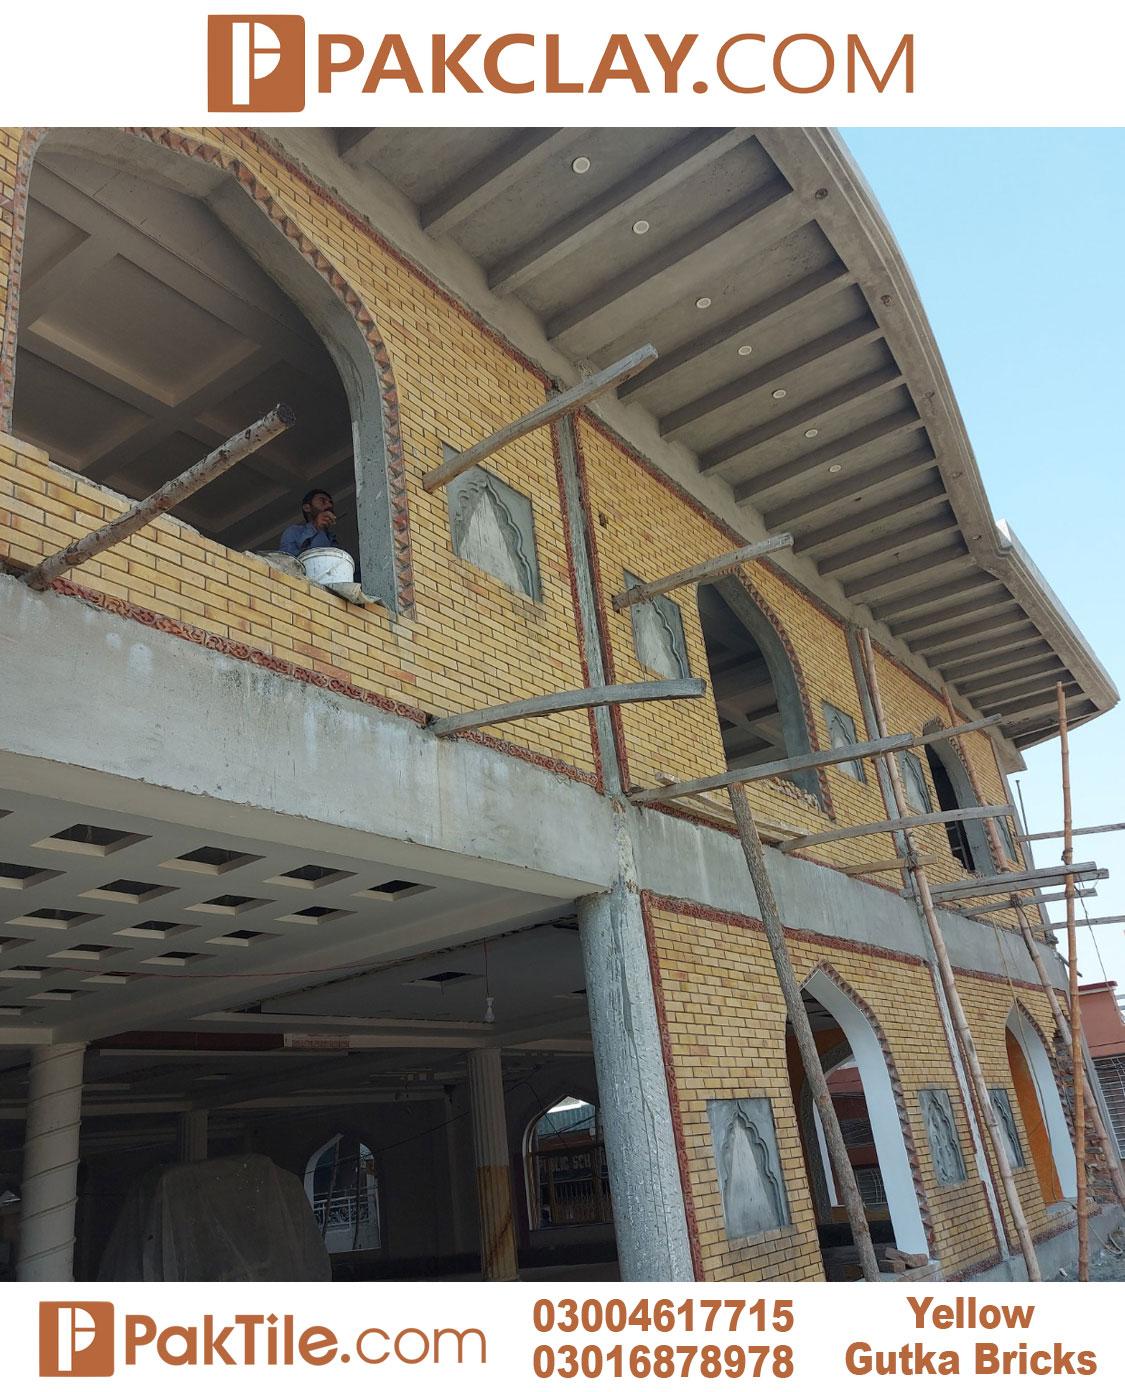 Yellow Gutka Bricks in Lahore